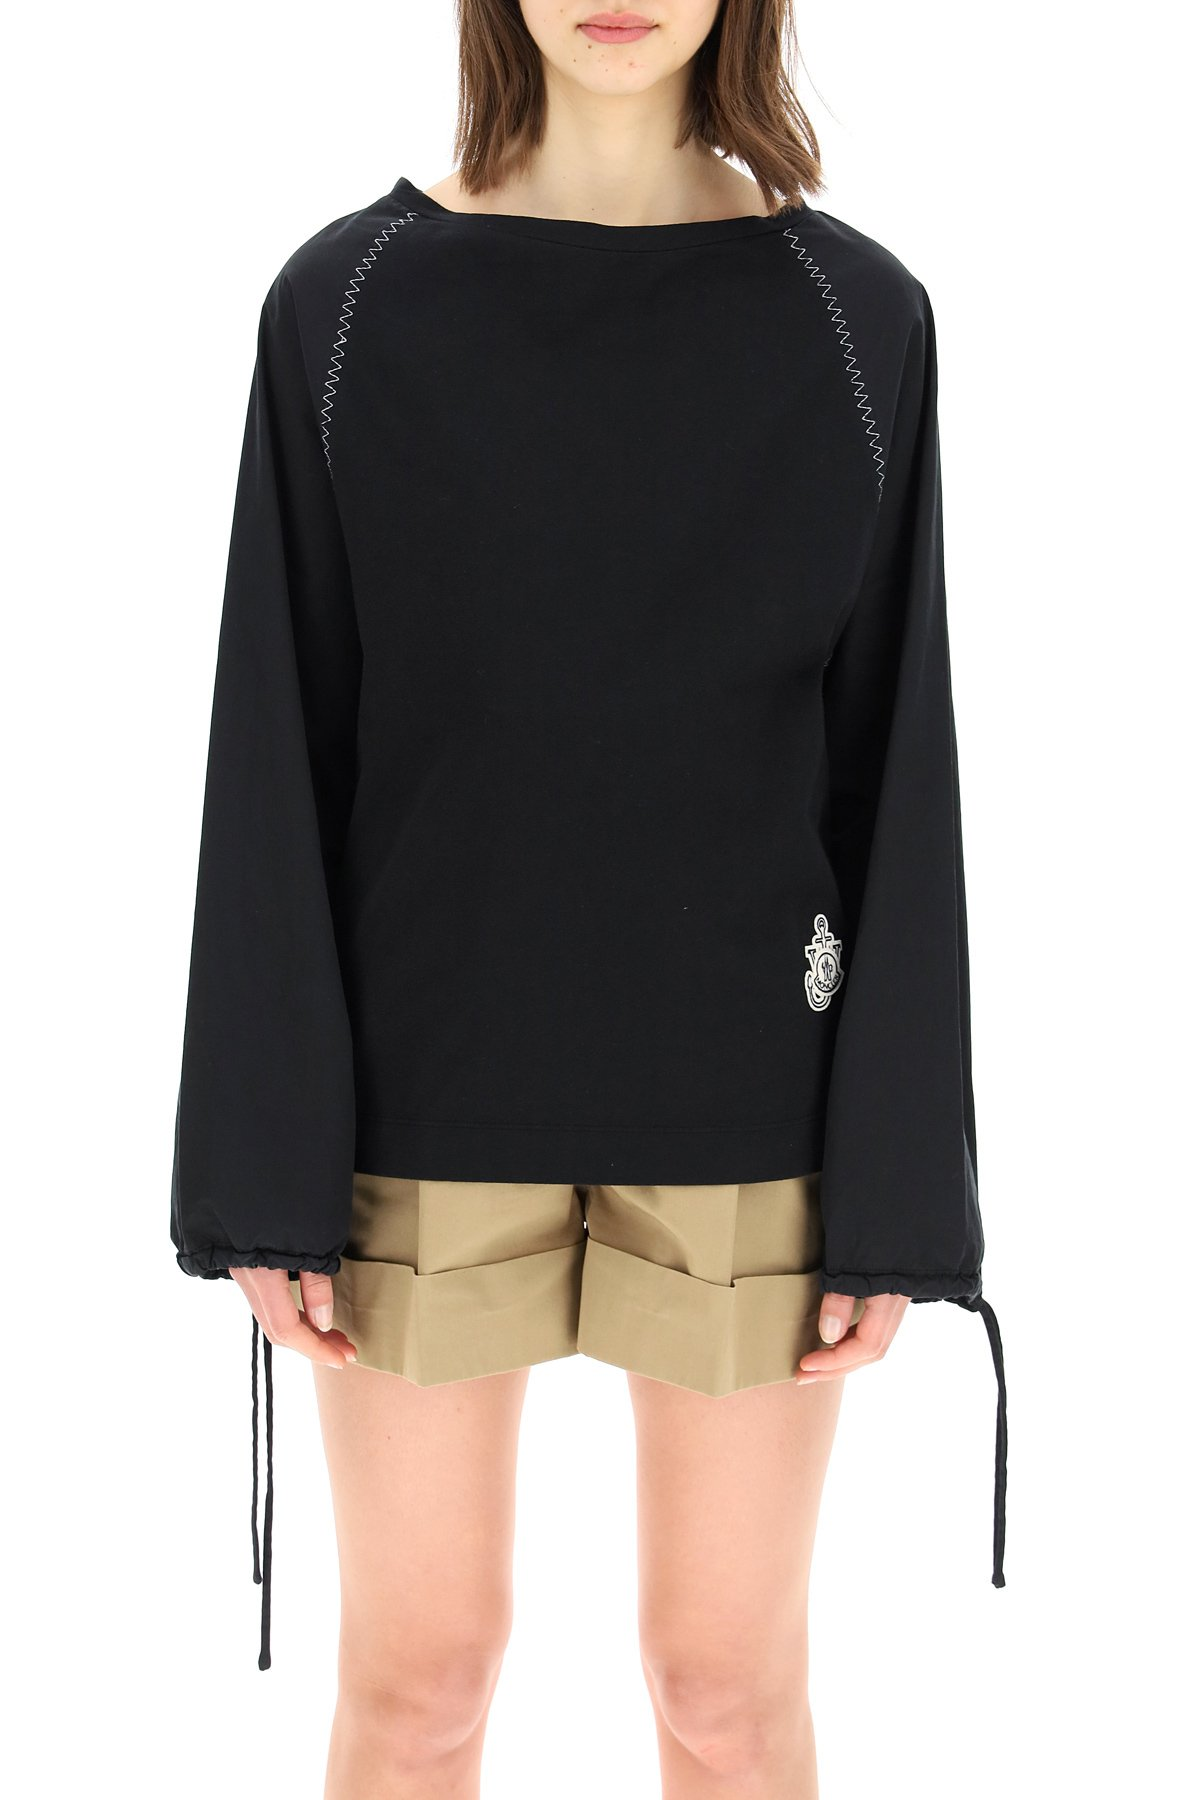 Moncler x jwanderson blusa in jersey e popeline moncler genius 1